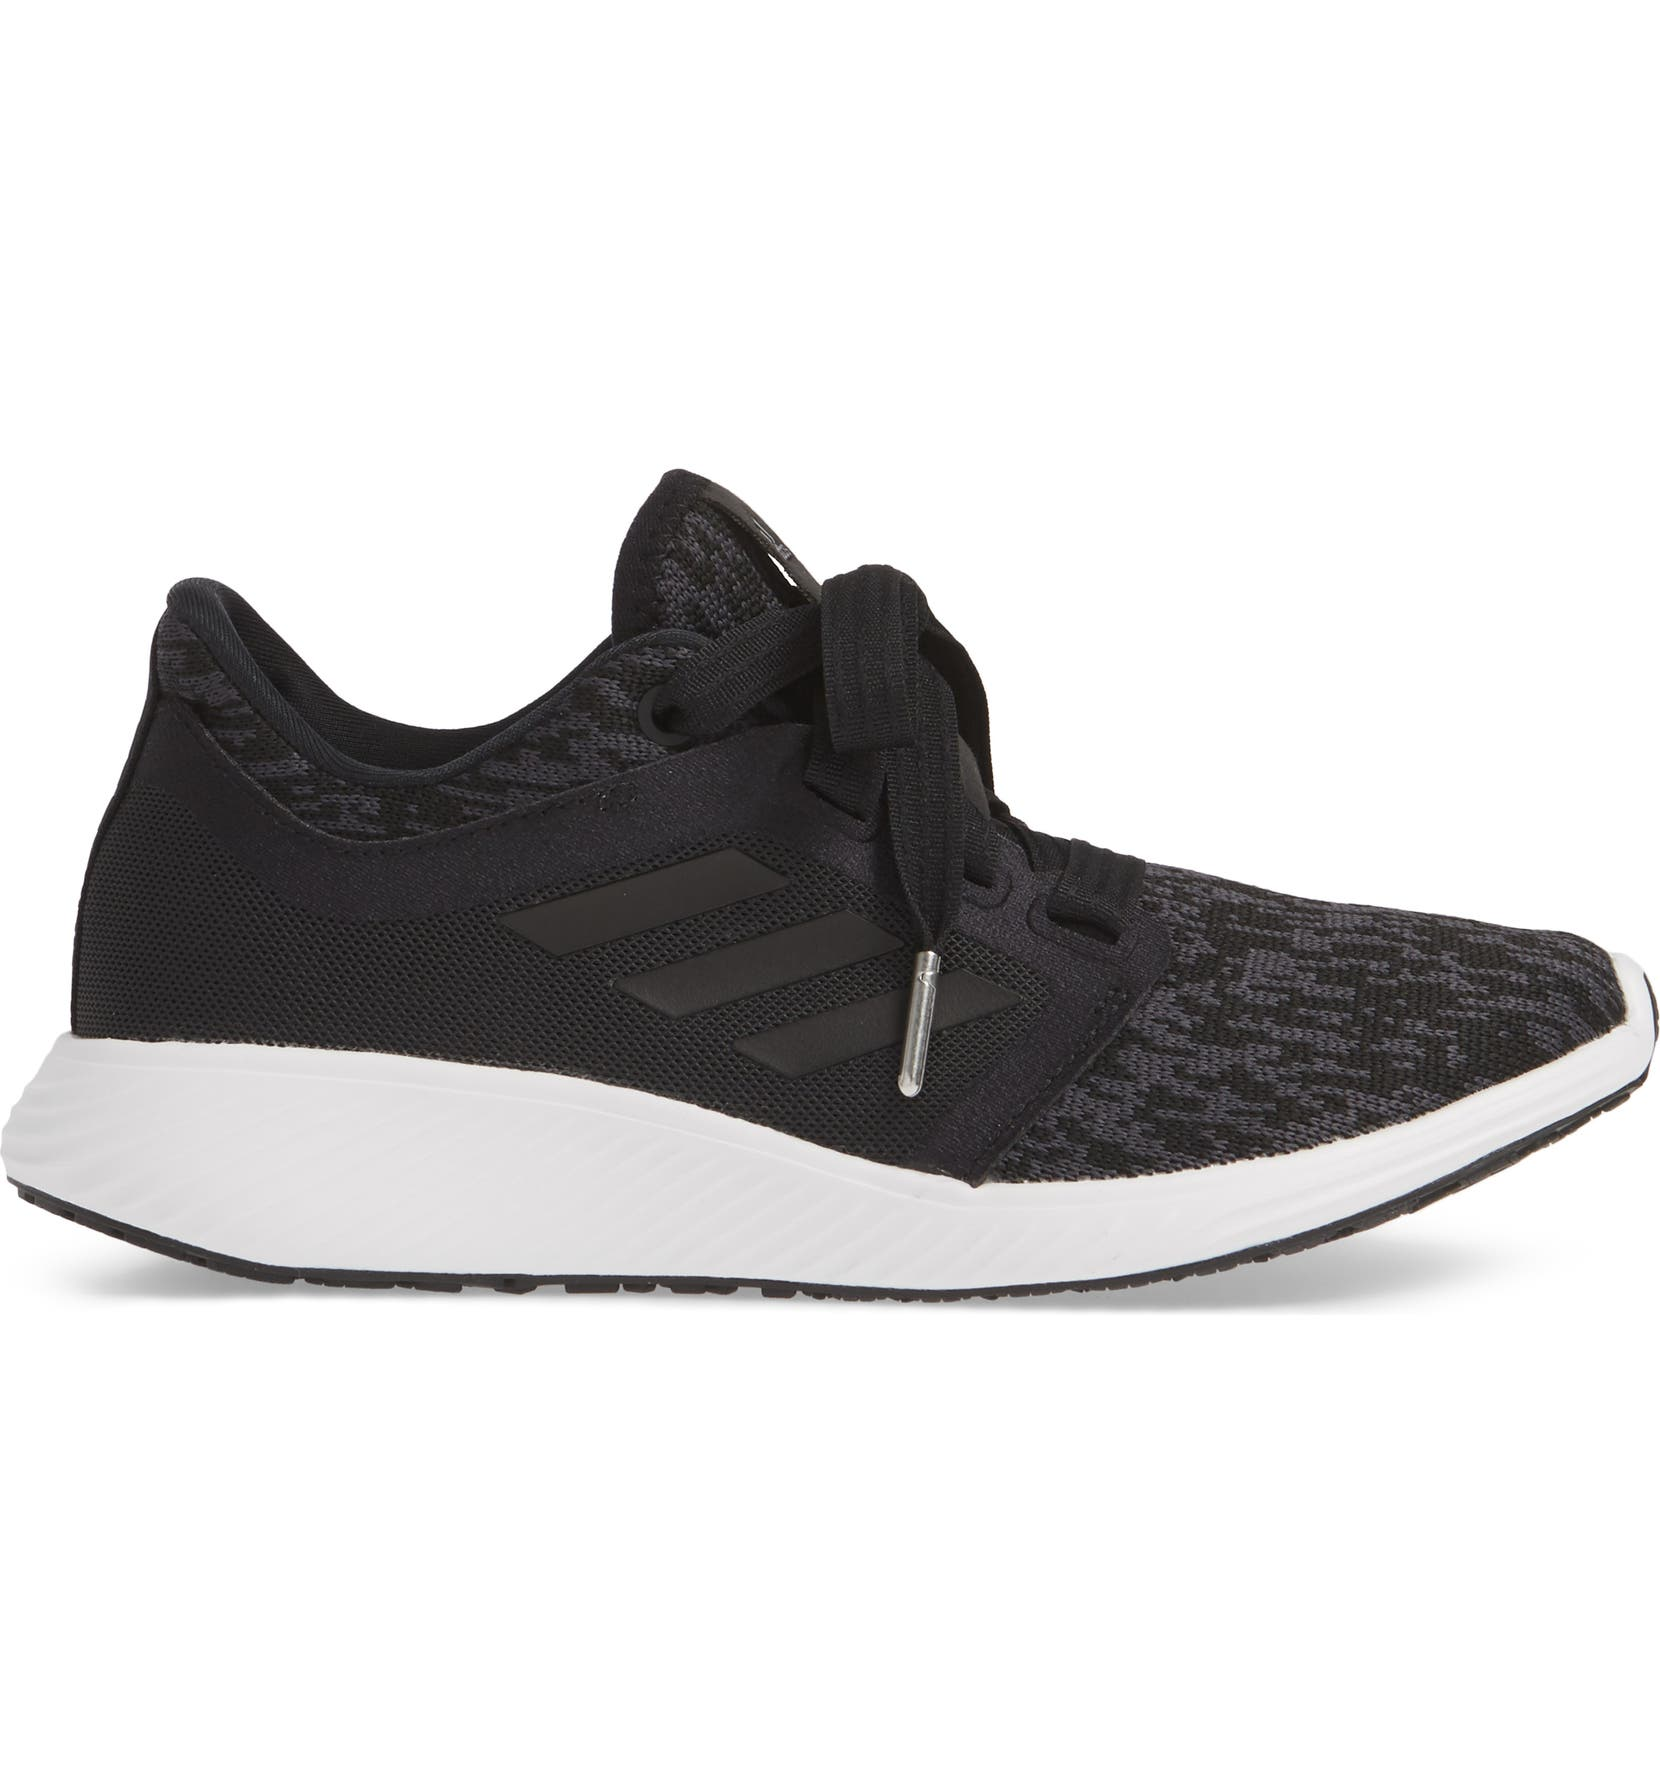 online store d0f99 b25d4 adidas Edge Lux 3 Running Shoe (Women)  Nordstrom